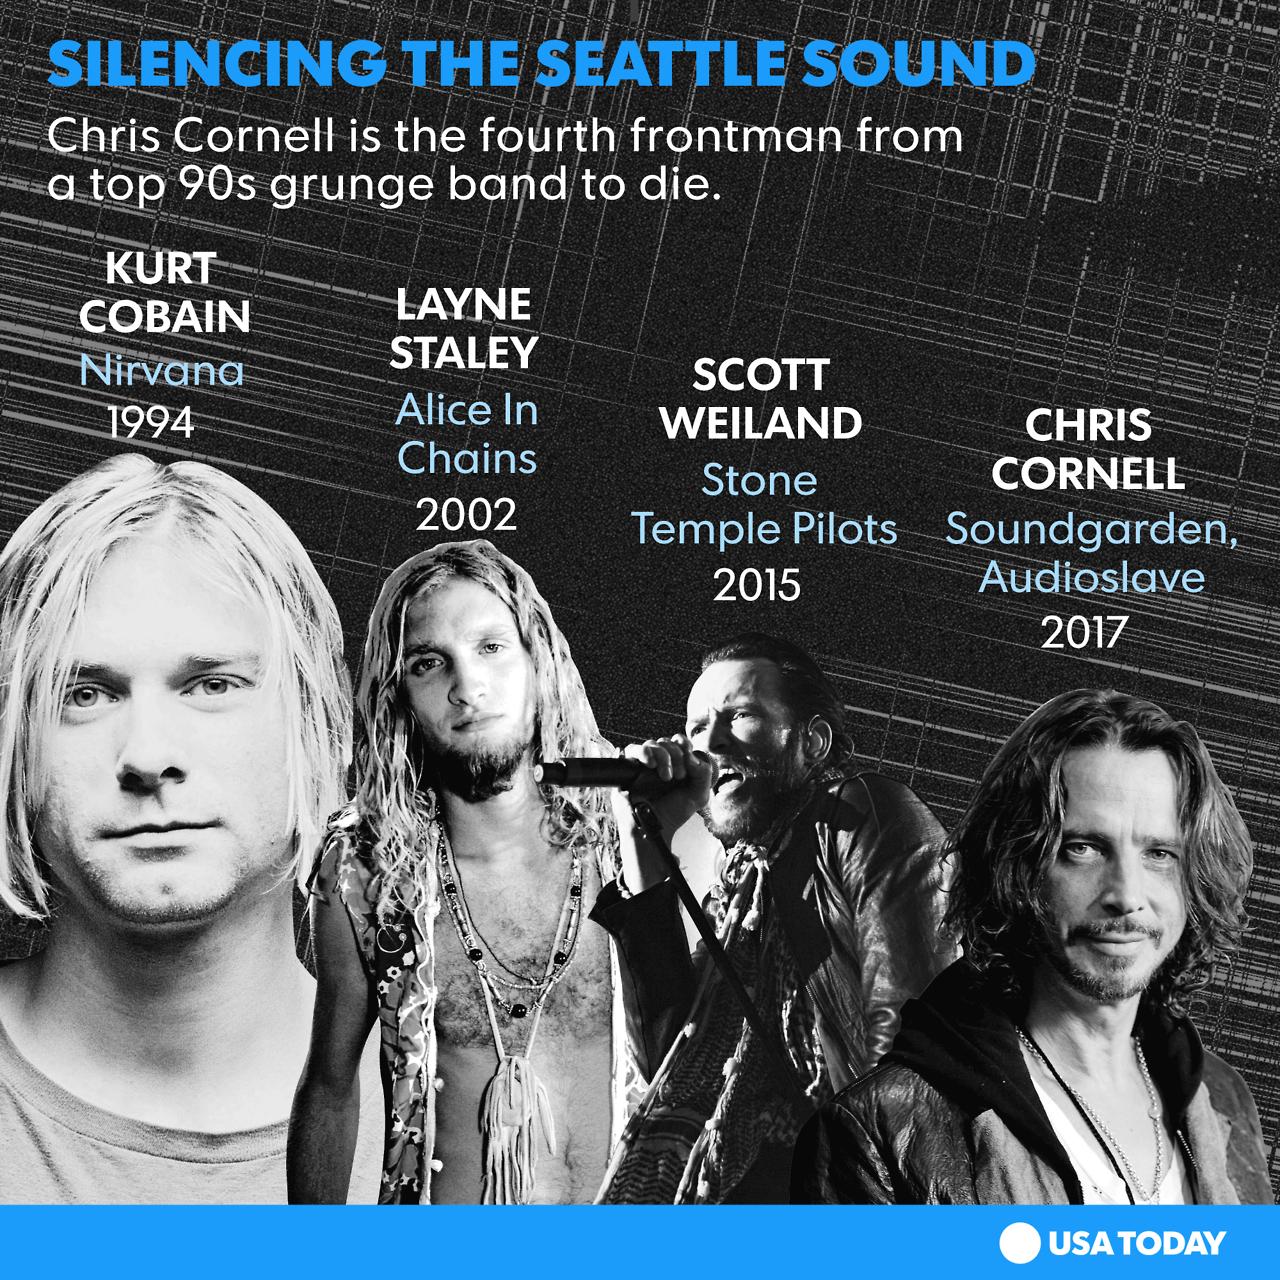 USA TODAY — Kurt Cobain. Layne Staley. Scott Weiland. And